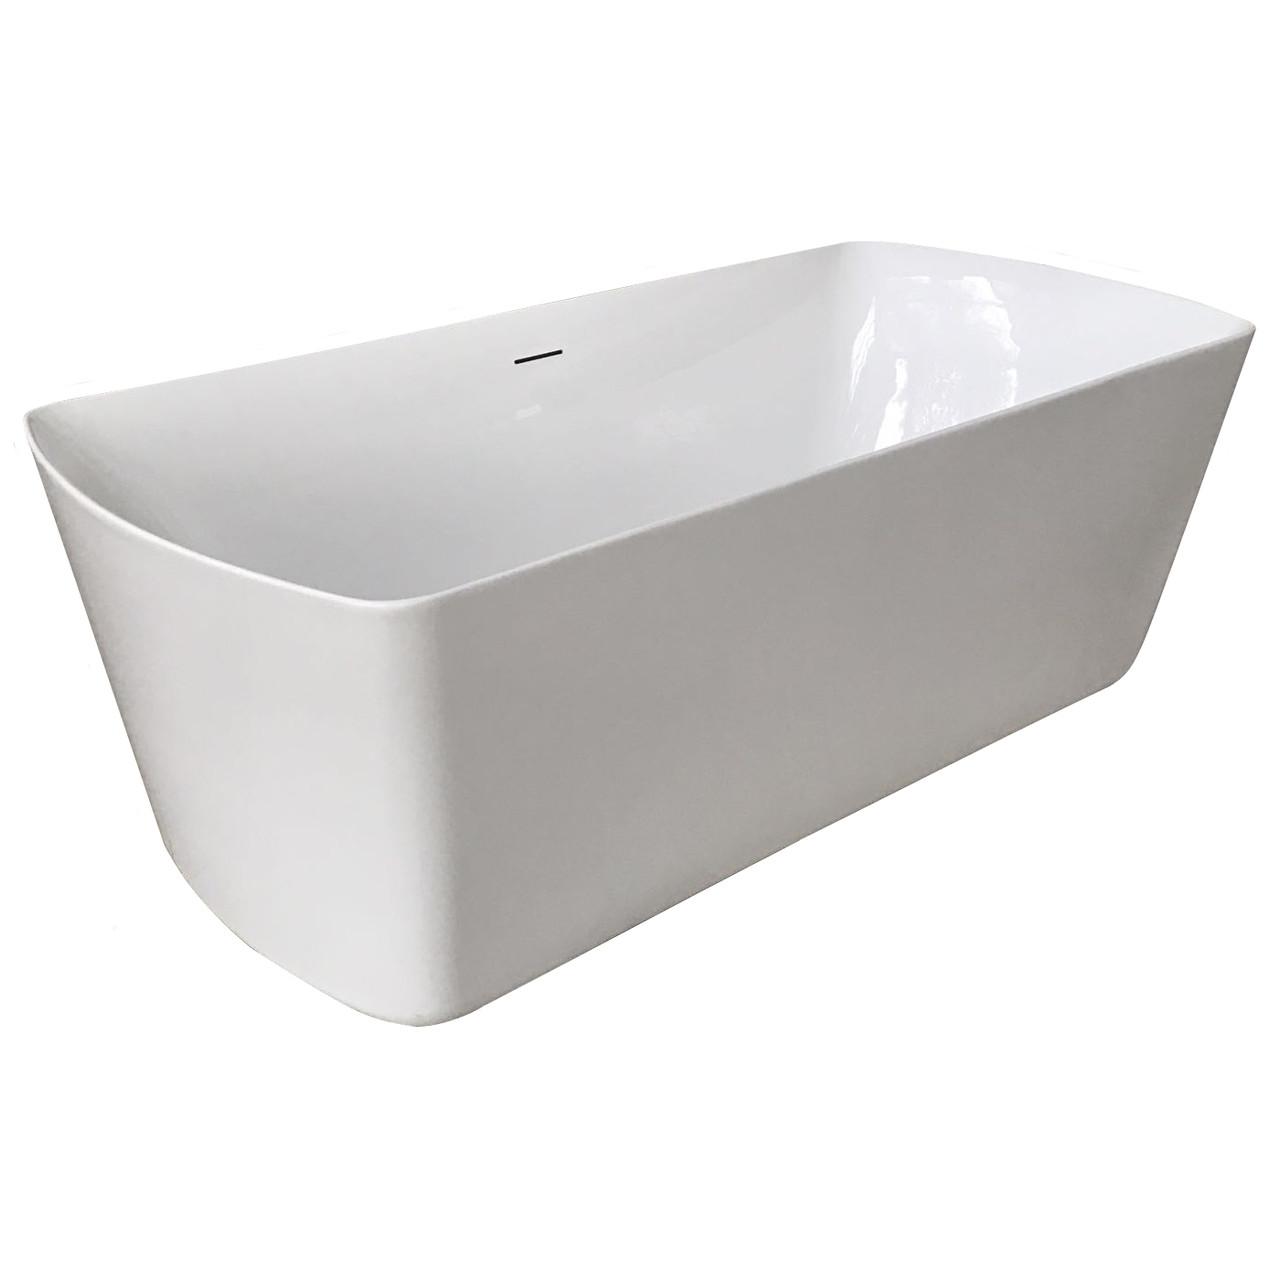 Ванна акрилова окремостояча Volle 180х85х61 із сифоном 🇪🇸